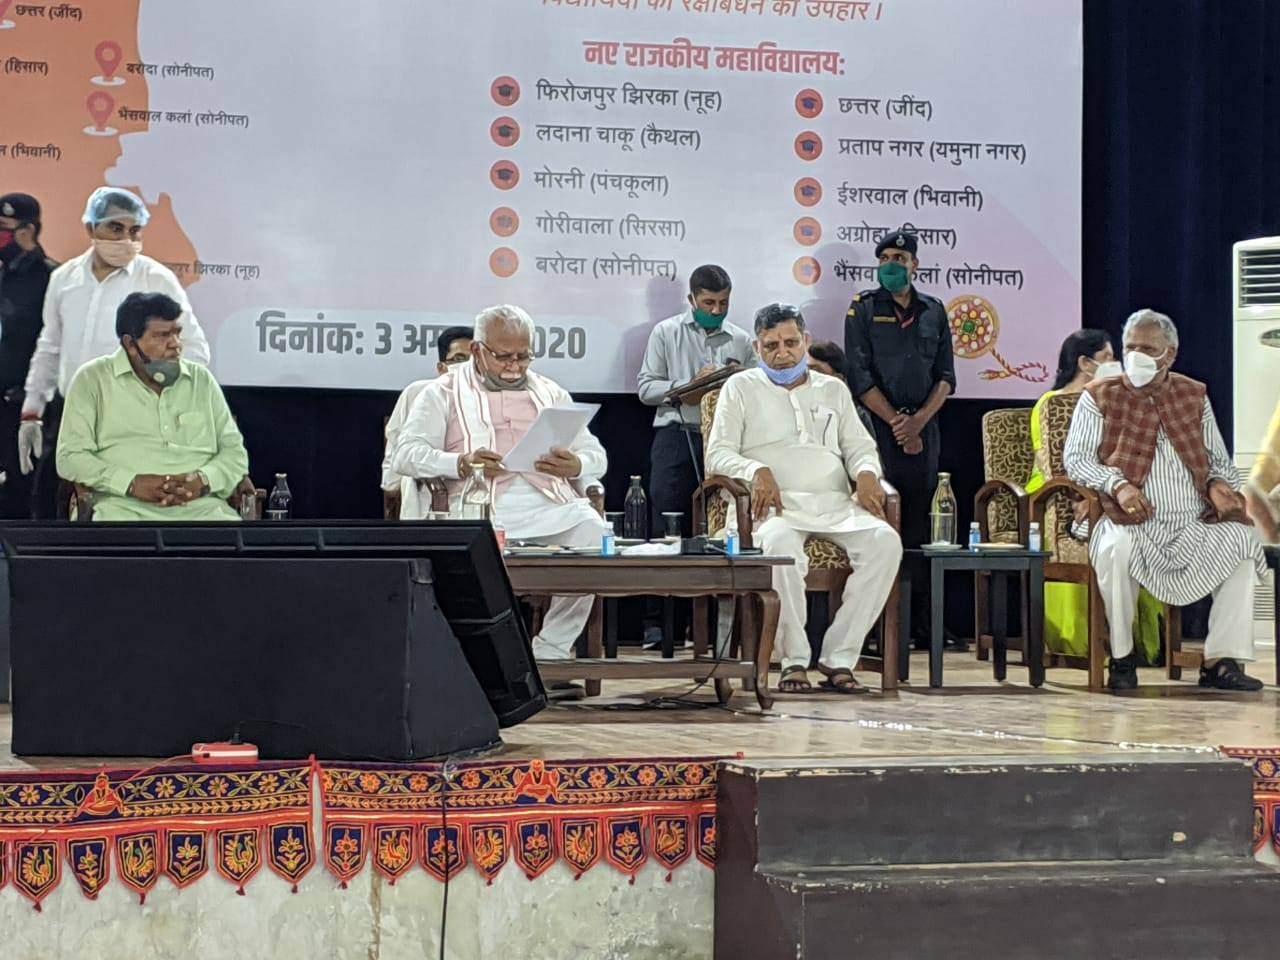 CM Manohar Lal's gift on Rakshabandhan, 11 new colleges announced